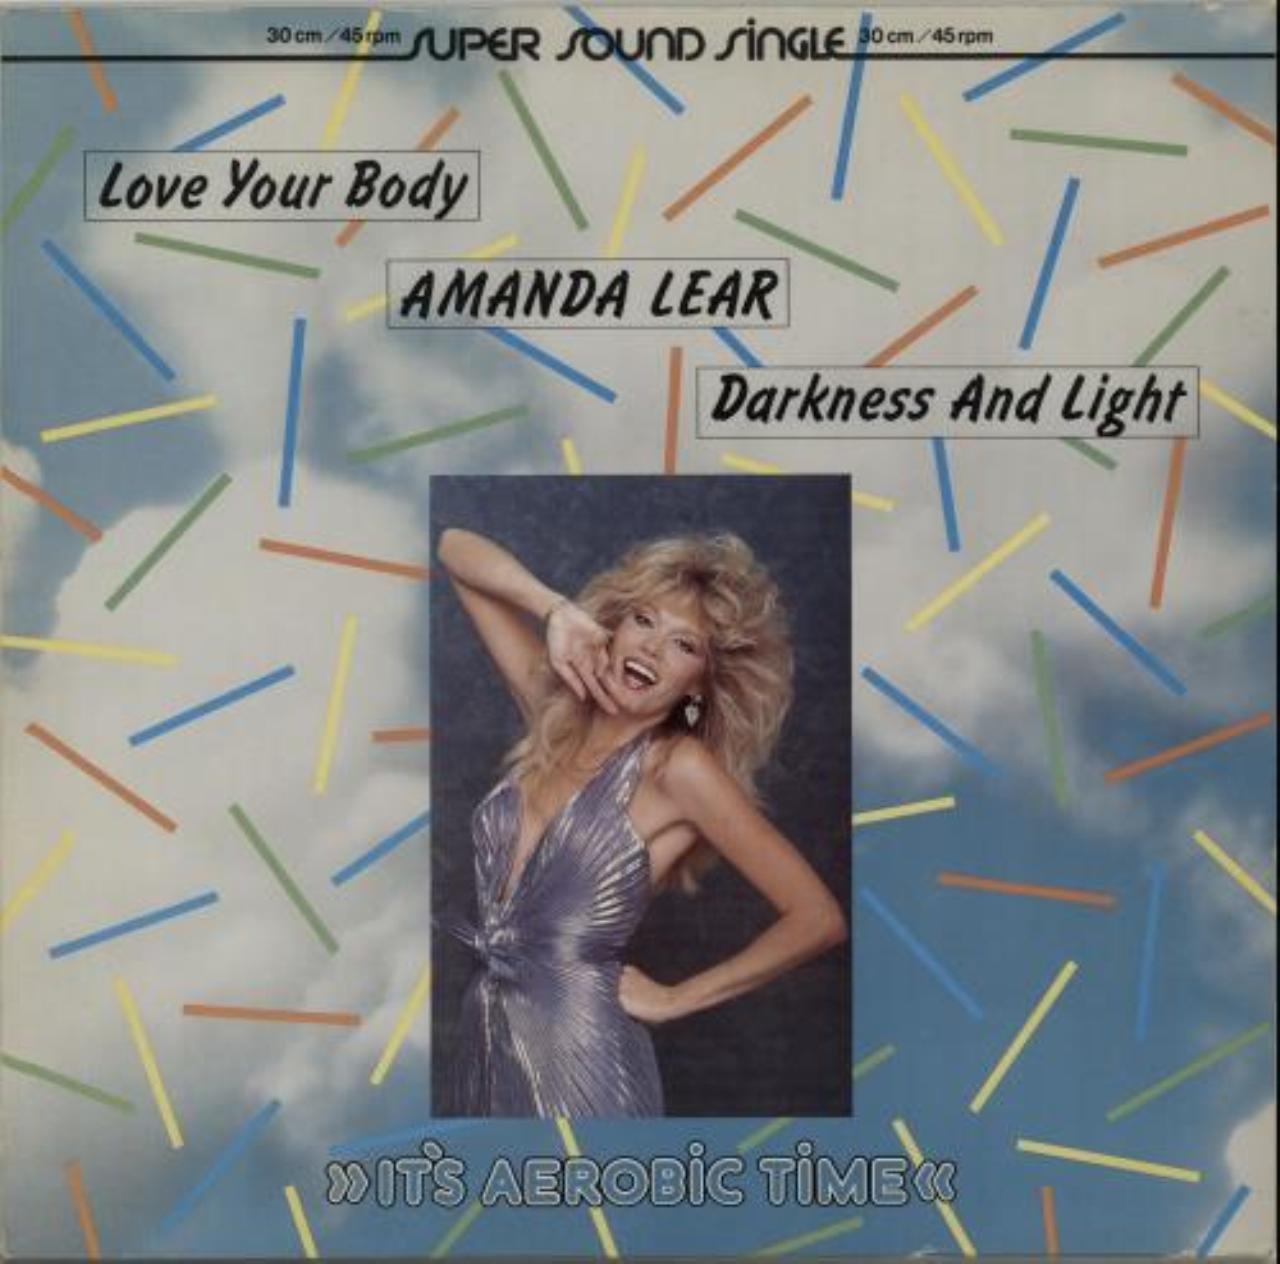 Amanda Lear Deutsch amanda lear - love your body - hitparade.ch